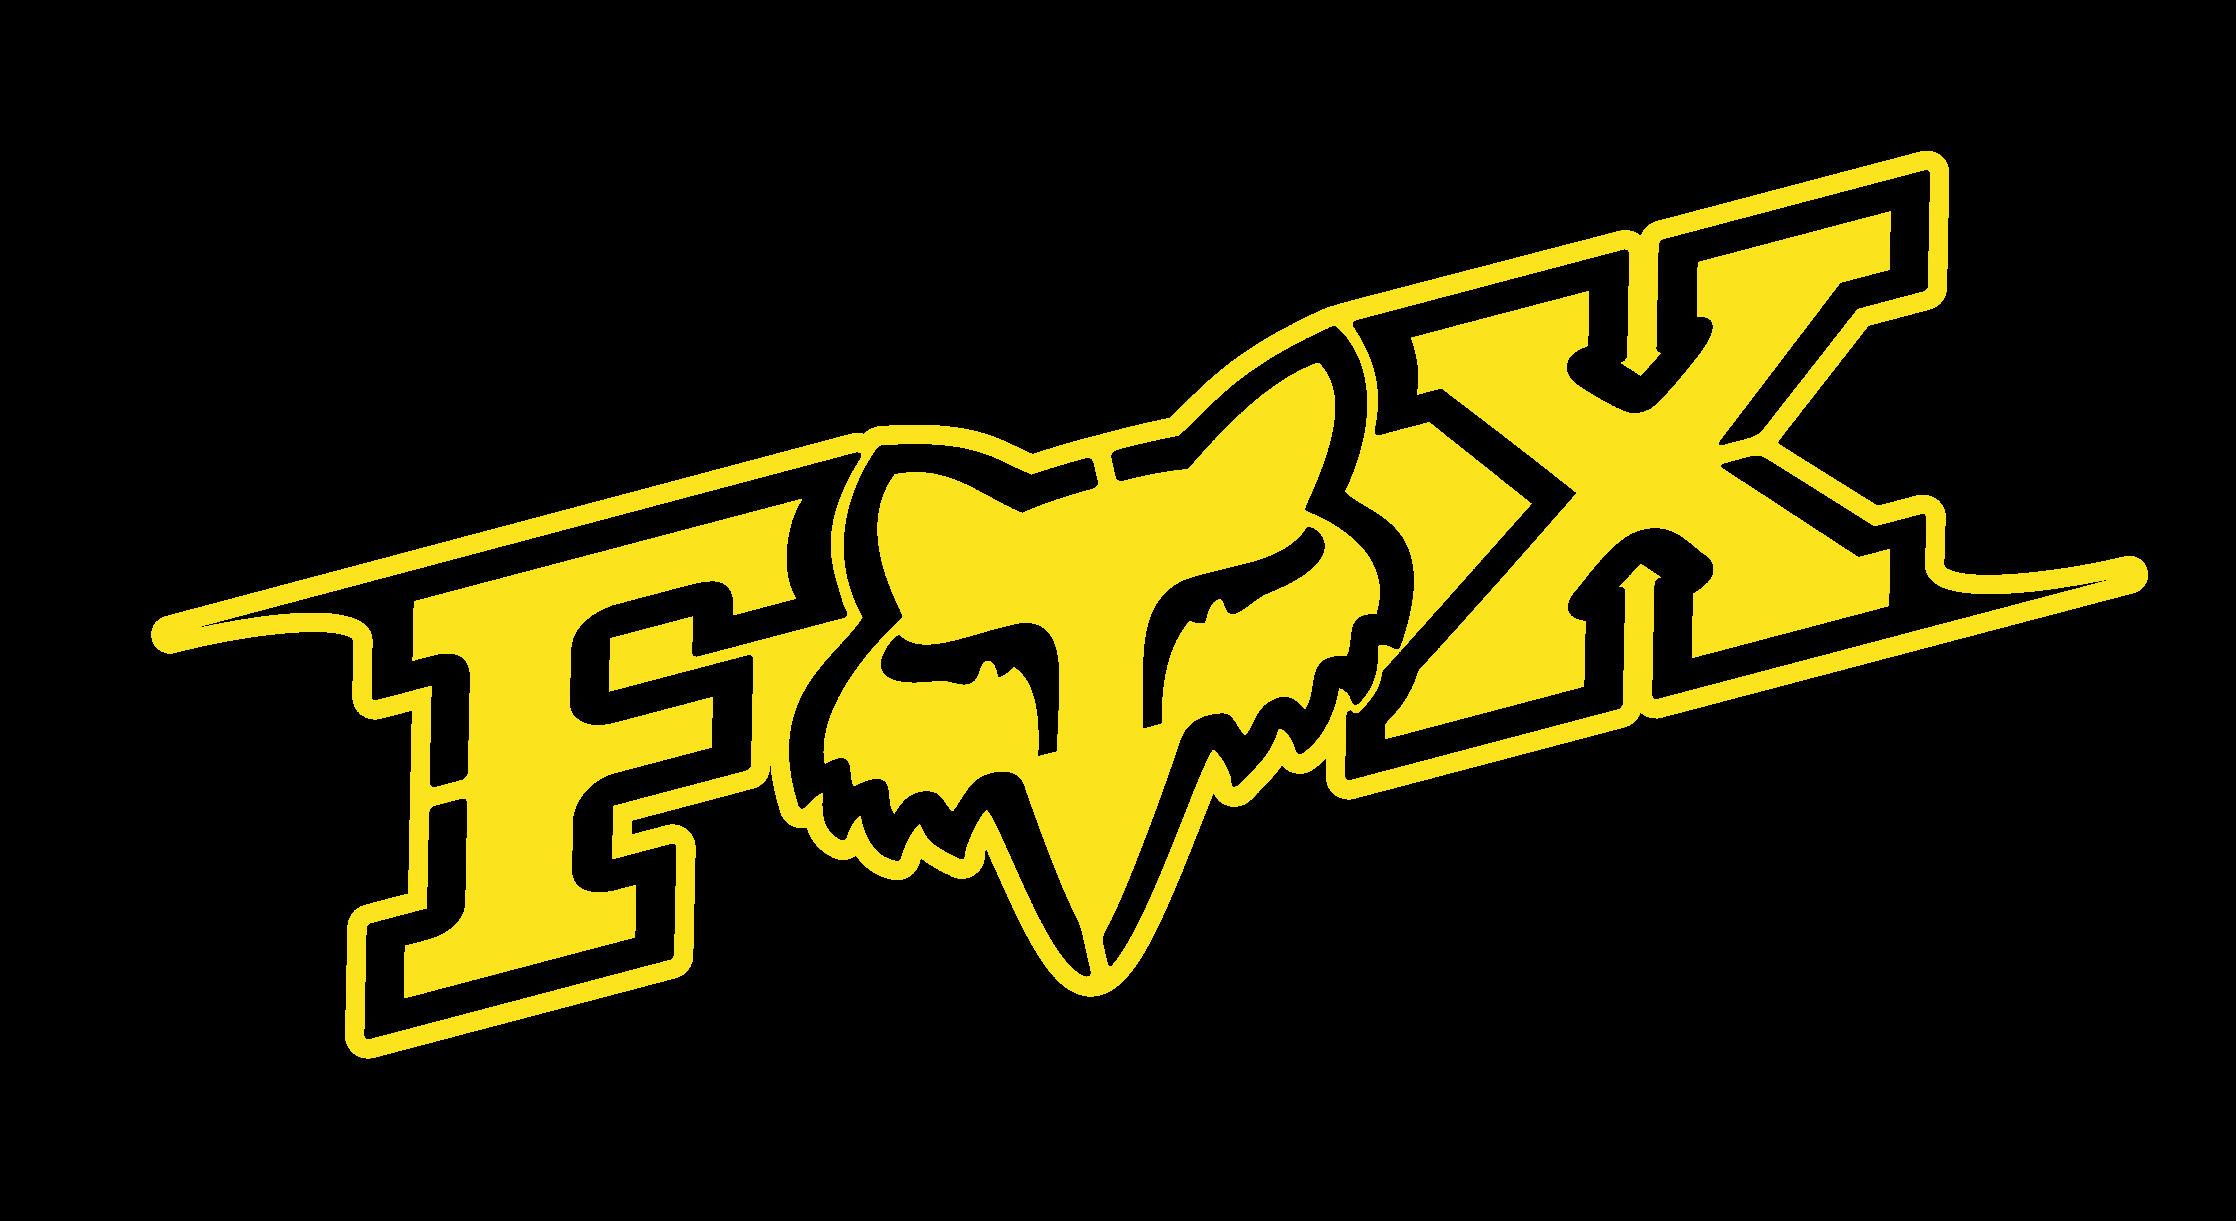 Best Logos Wallpaper Fox Racing 806838 Logos 2236x1221